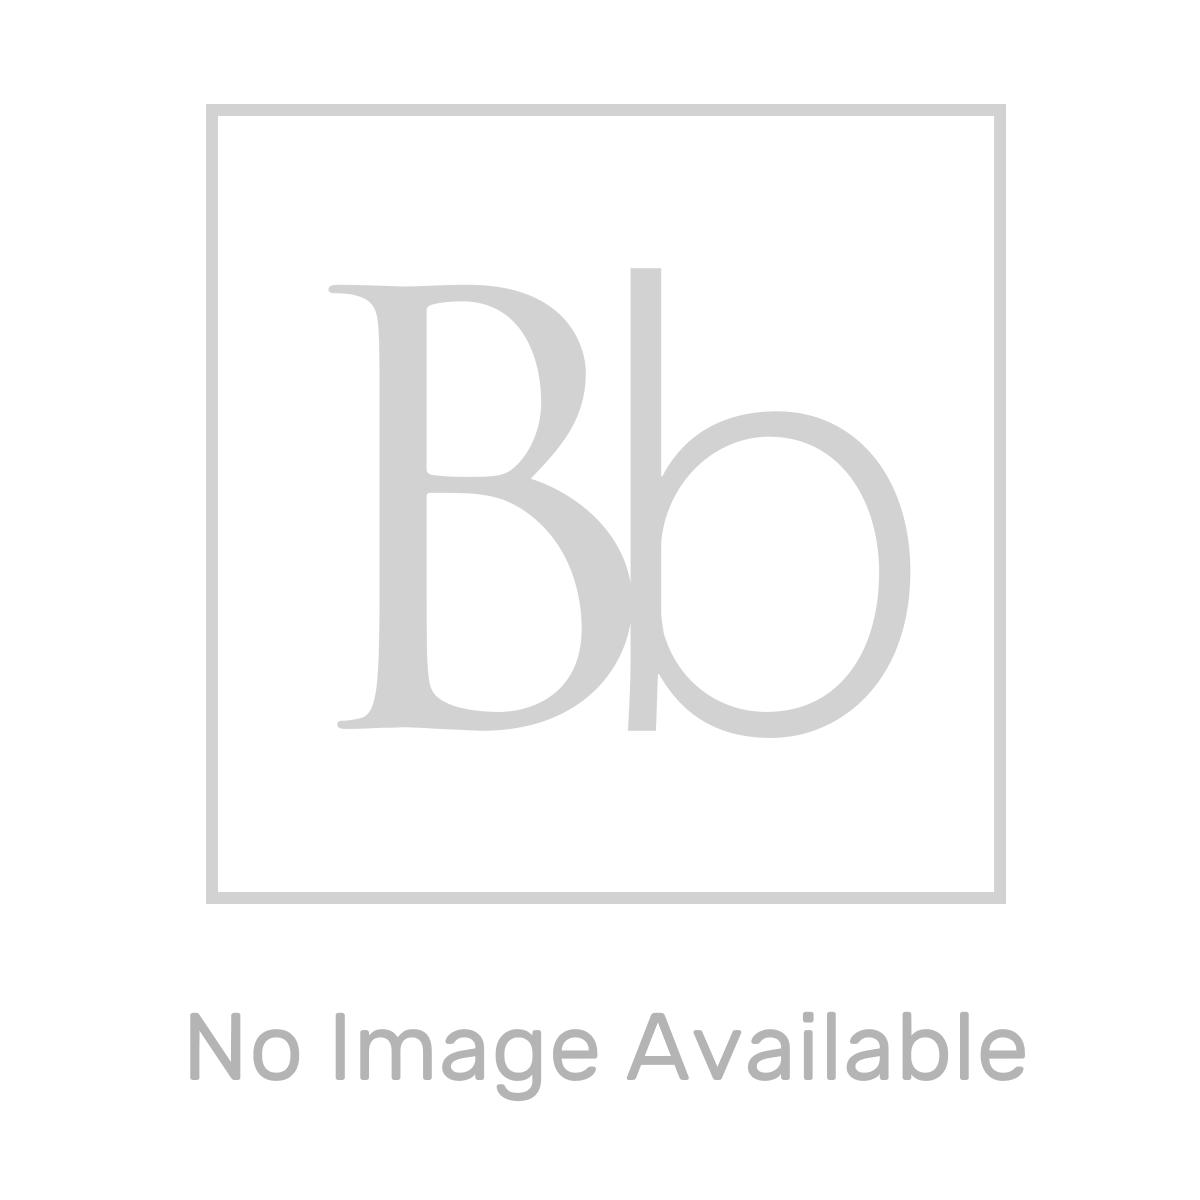 Stuart Turner 46612 Diver 45 Boostamatic Submersible Pump